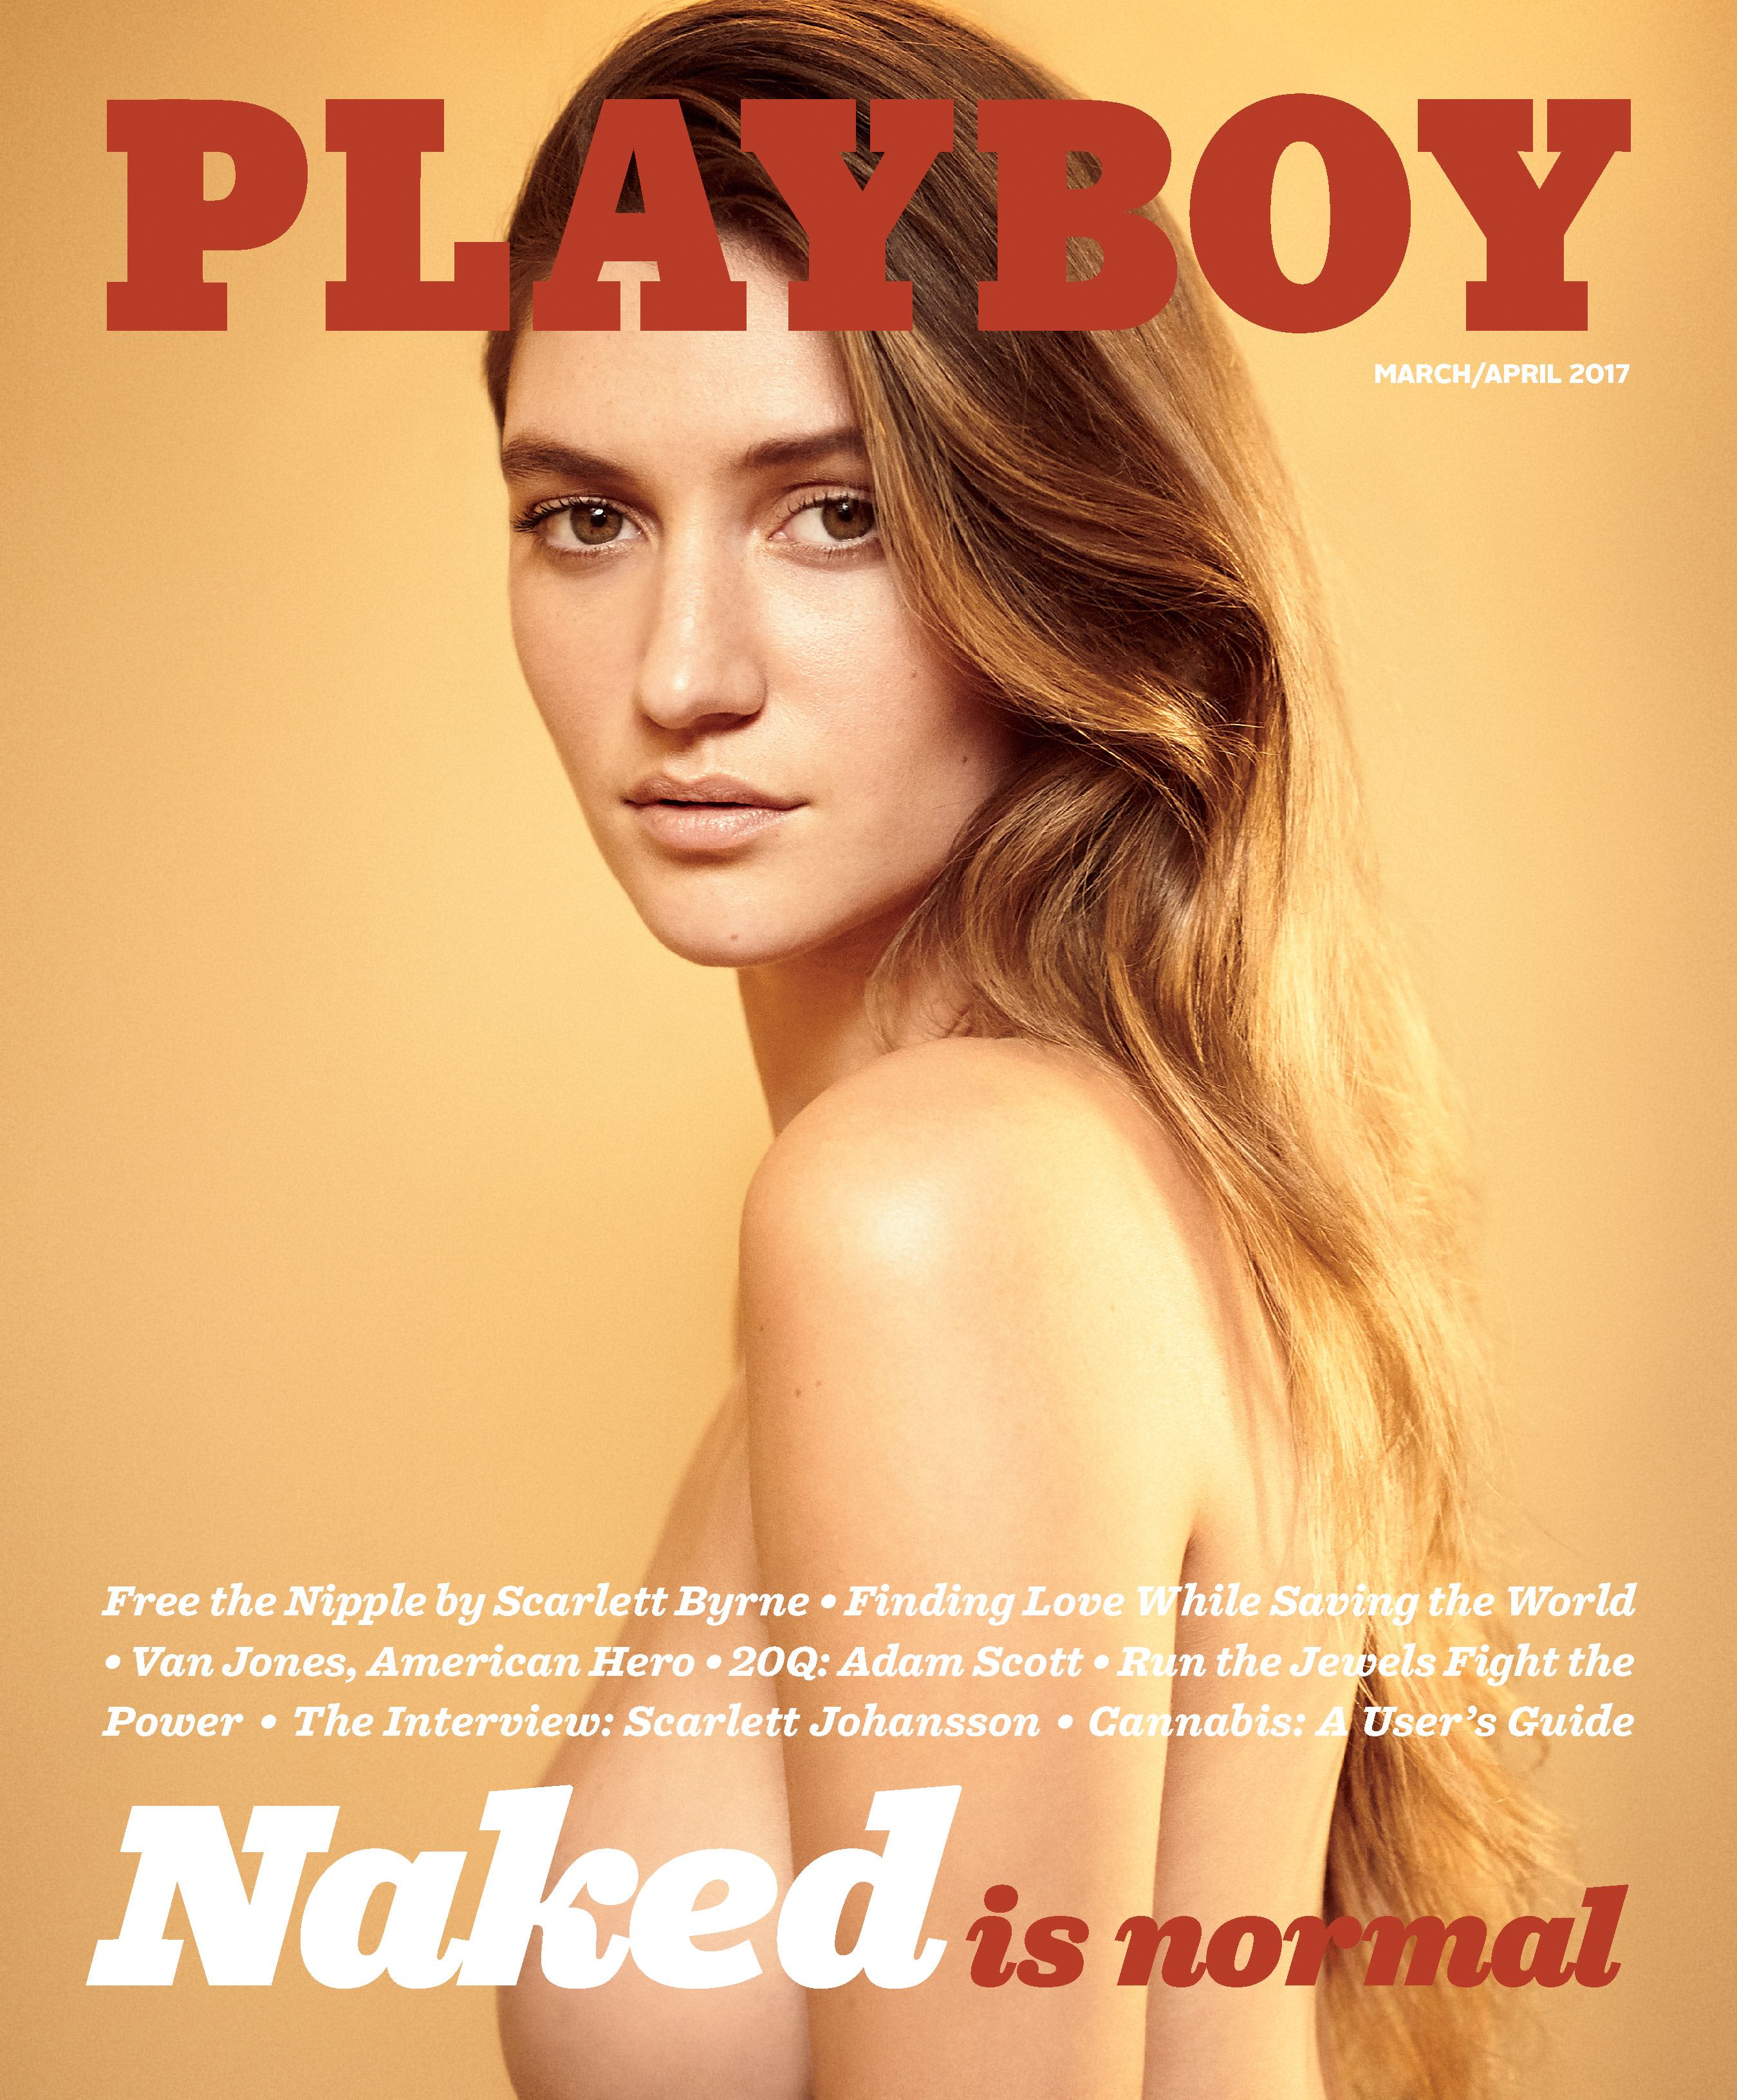 Handout: Elizabeth Elam, on the cover of Playboy 170213